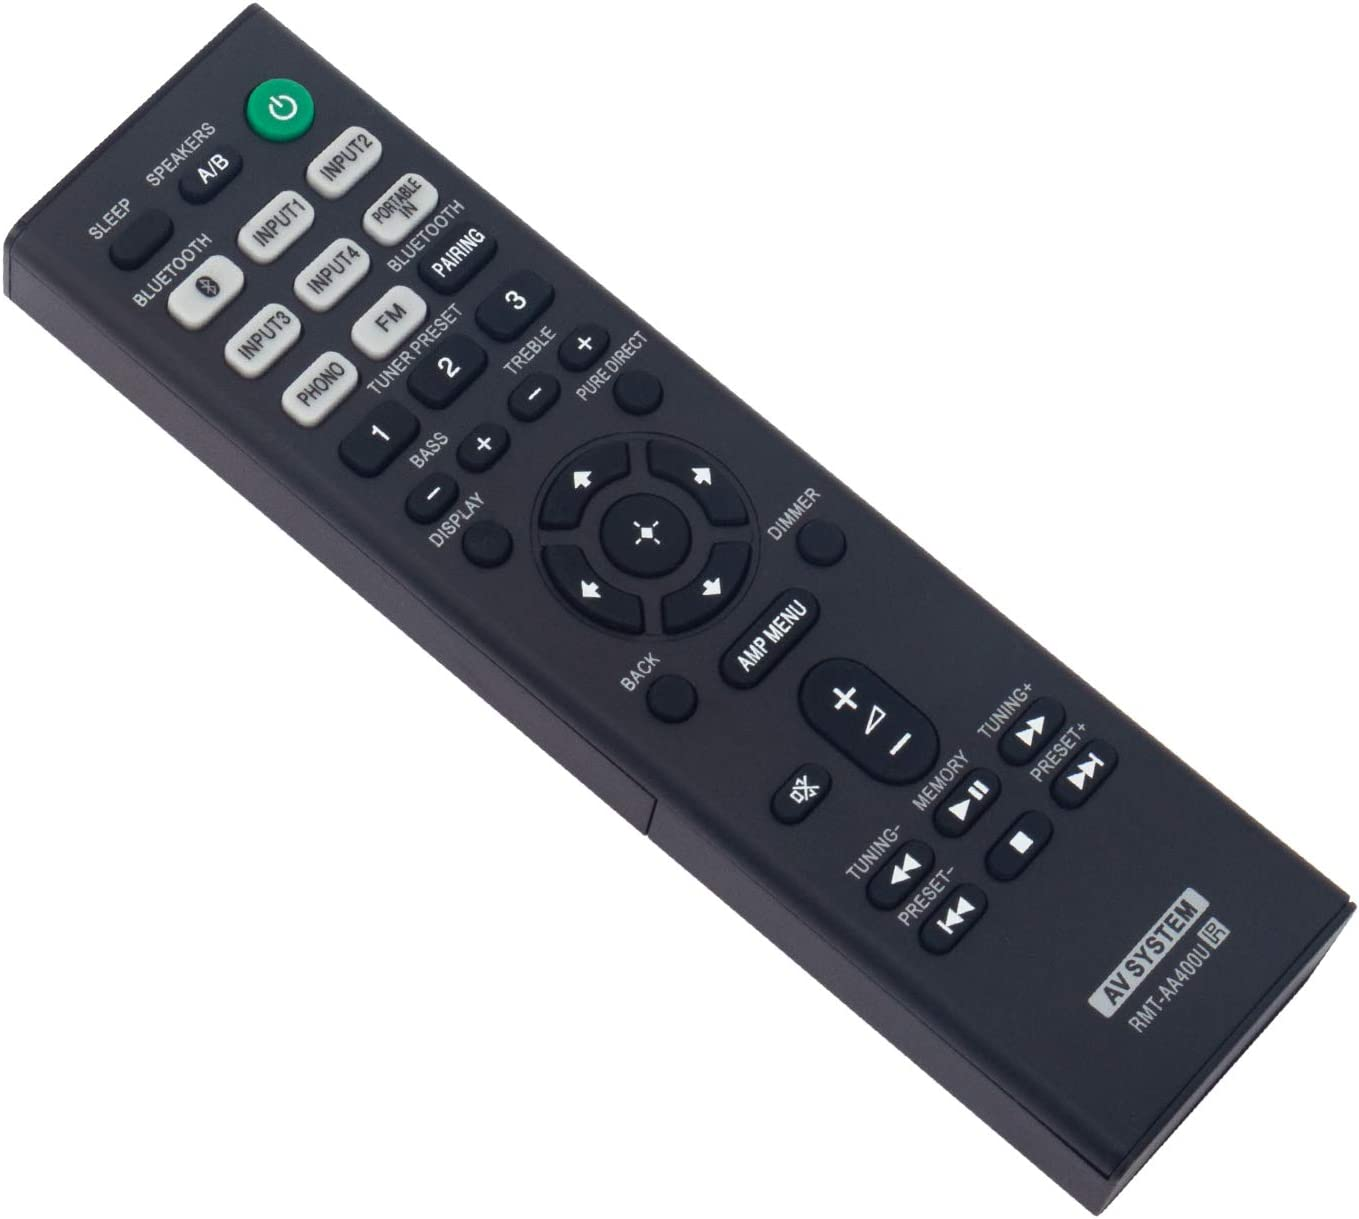 Selling RMT-AA400U Replace Remote Control High material WINFLIKE Co - RMTAA400U